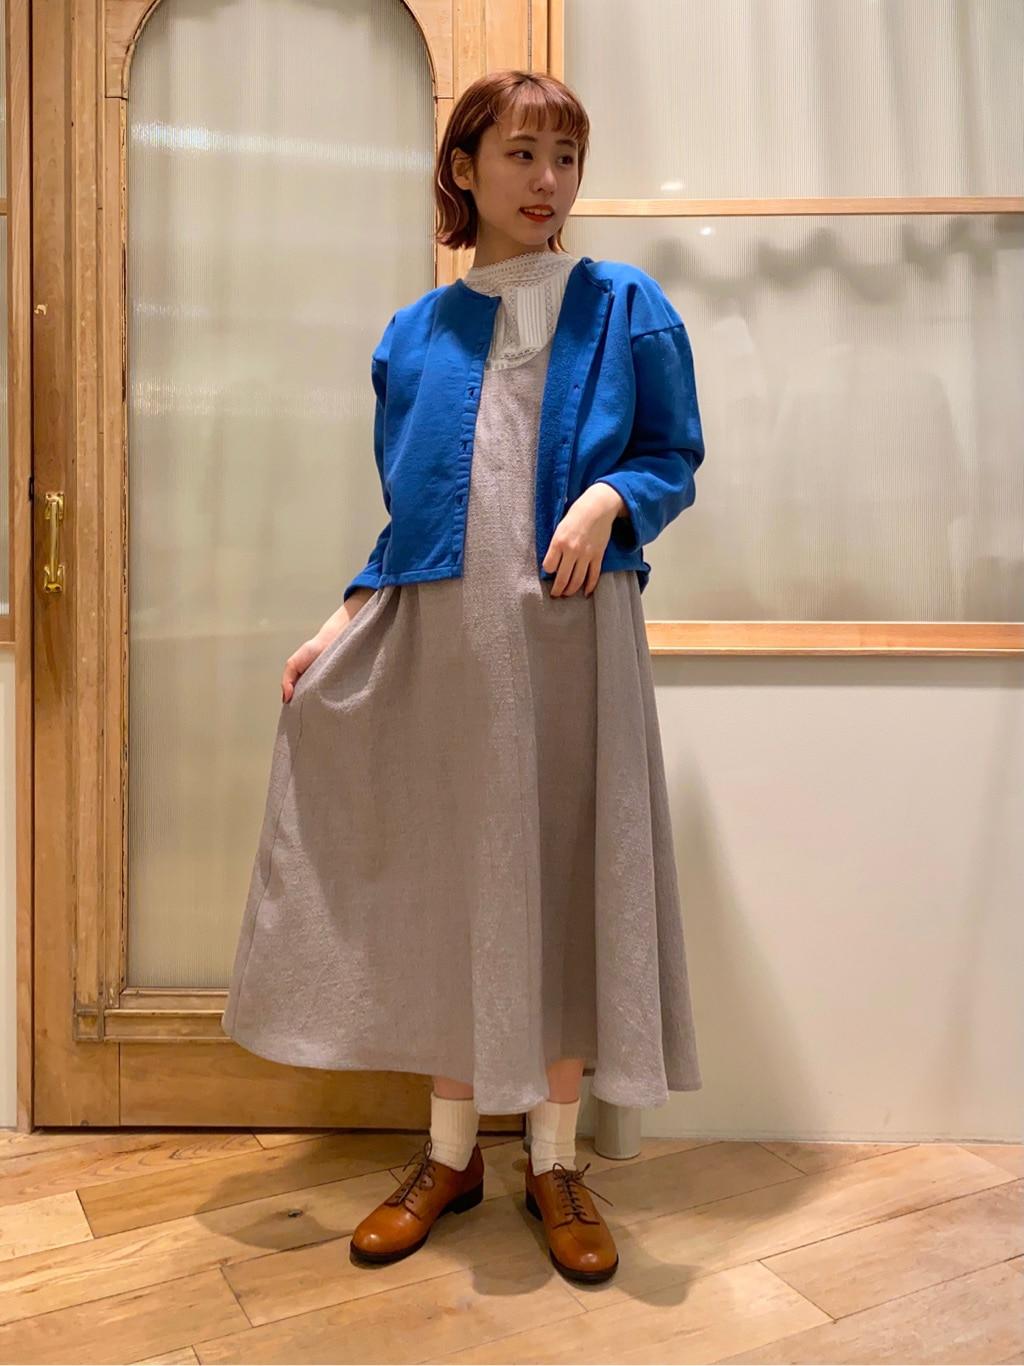 bulle de savon 新宿ミロード 身長:157cm 2020.12.18